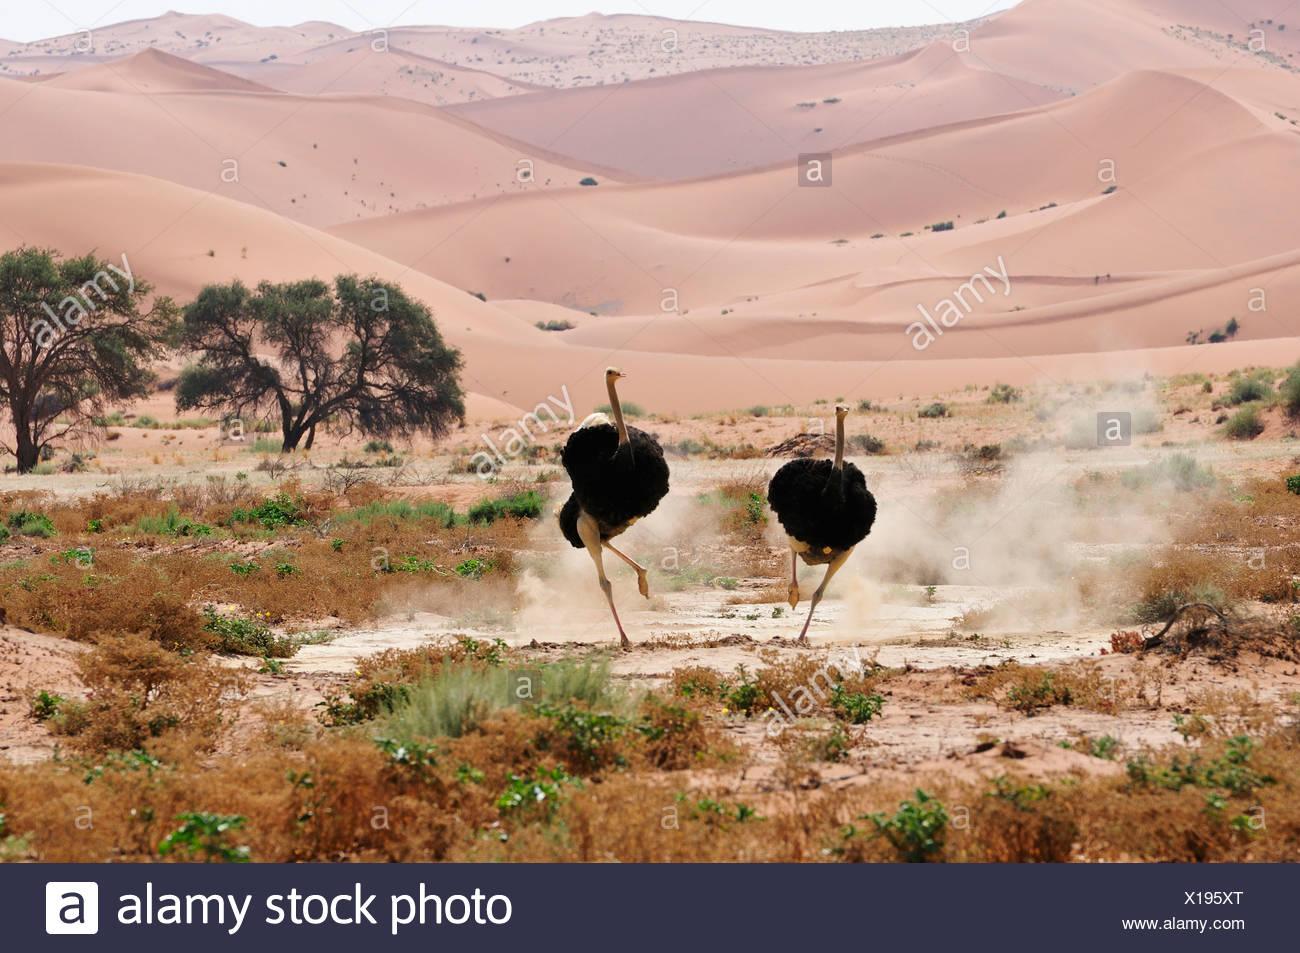 África Parque Namib Naukluft Dunas Hills Namibia Sossusvlei miedo carga africanos aves avestruz horizontal girando Foto de stock